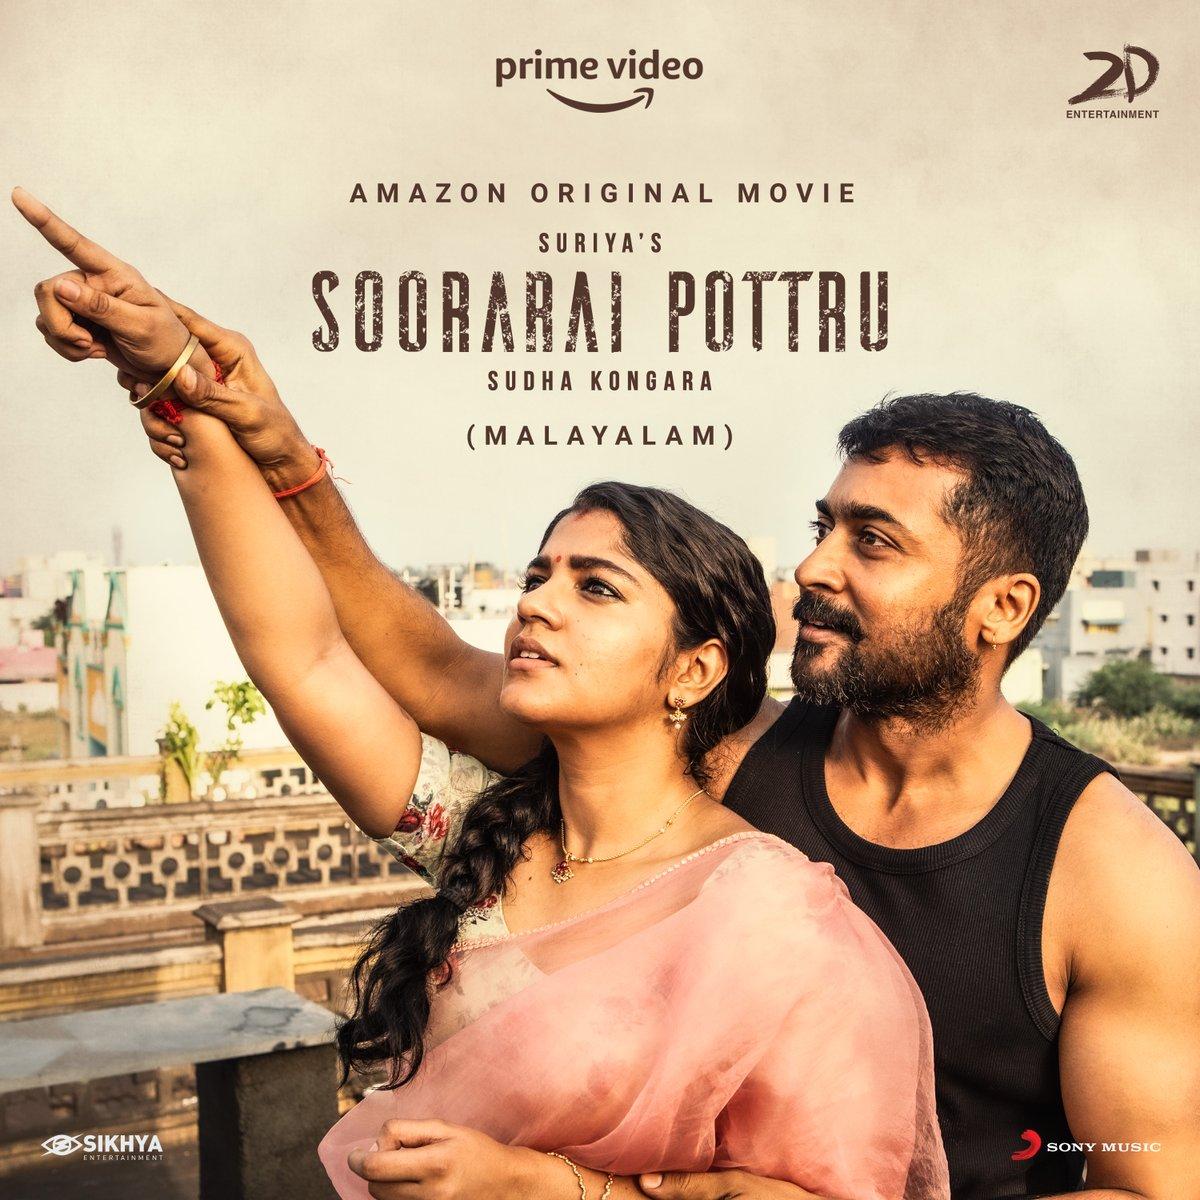 Time to watch the song videos of #SooraraiPottruMalayalam right here! ♥️🥰  ➡️ https://t.co/FKgqSBLFCv  @Suriya_offl #SudhaKongara @2D_ENTPVTLTD @rajsekarpandian @gvprakash @PrimeVideoIN @sikhyaent   #SooraraiPottru https://t.co/yL14LaKNYO